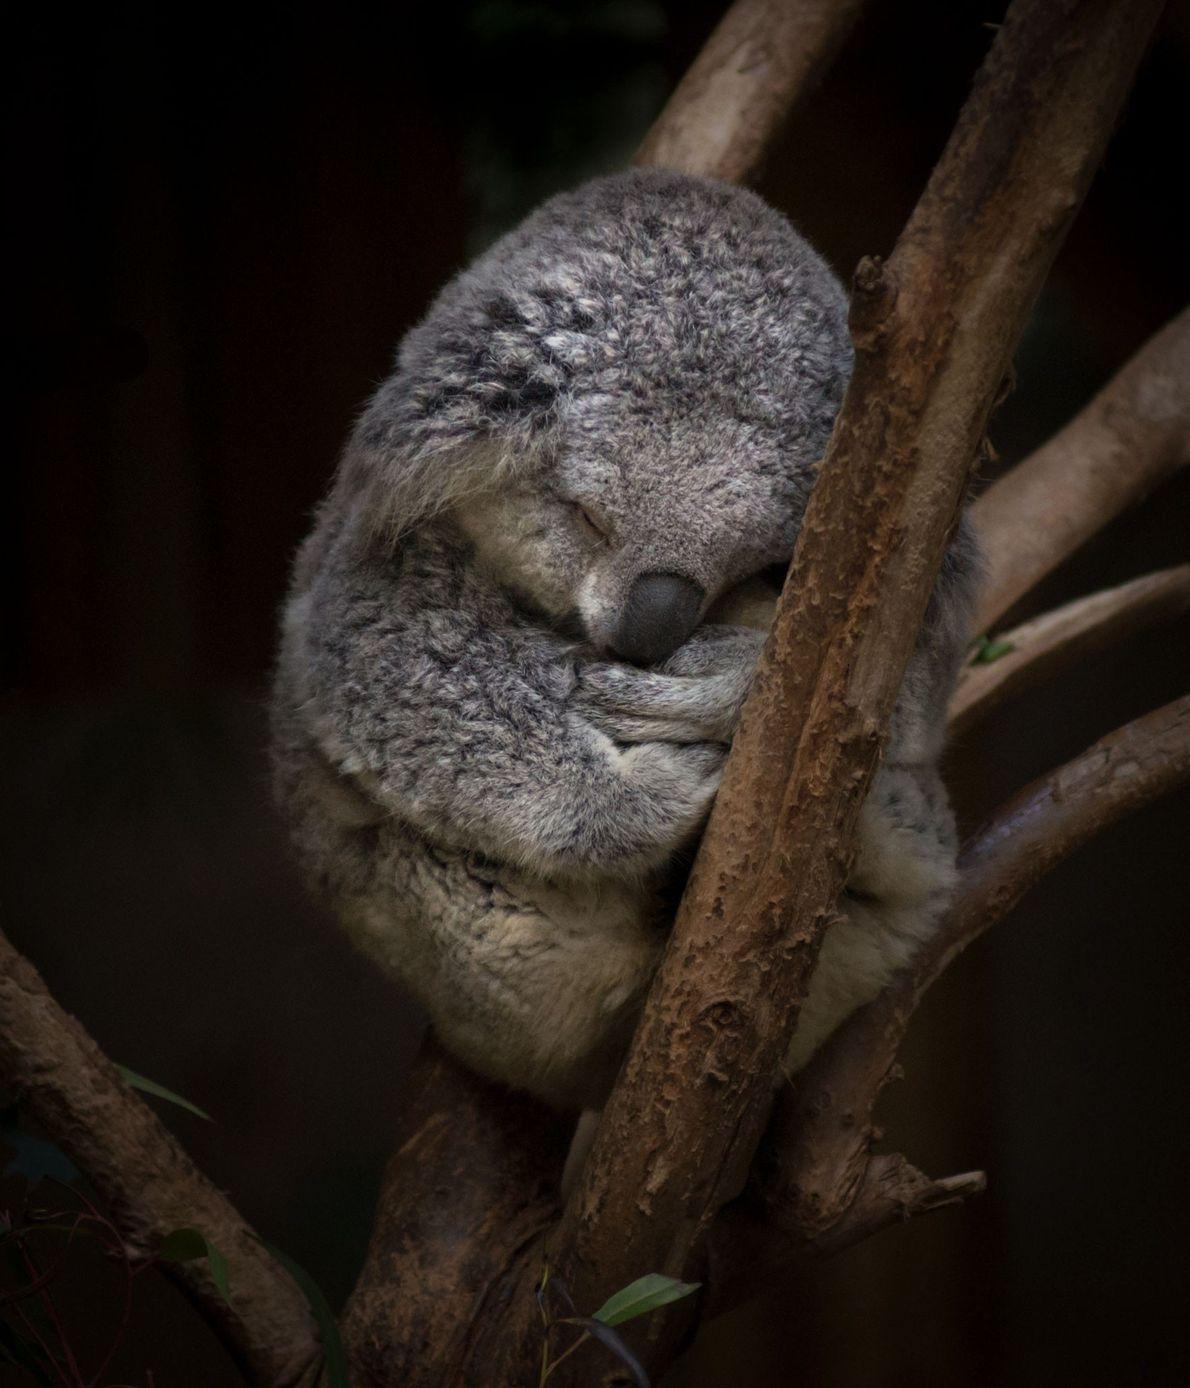 A Koala bear, photographed in Los Angeles, California.